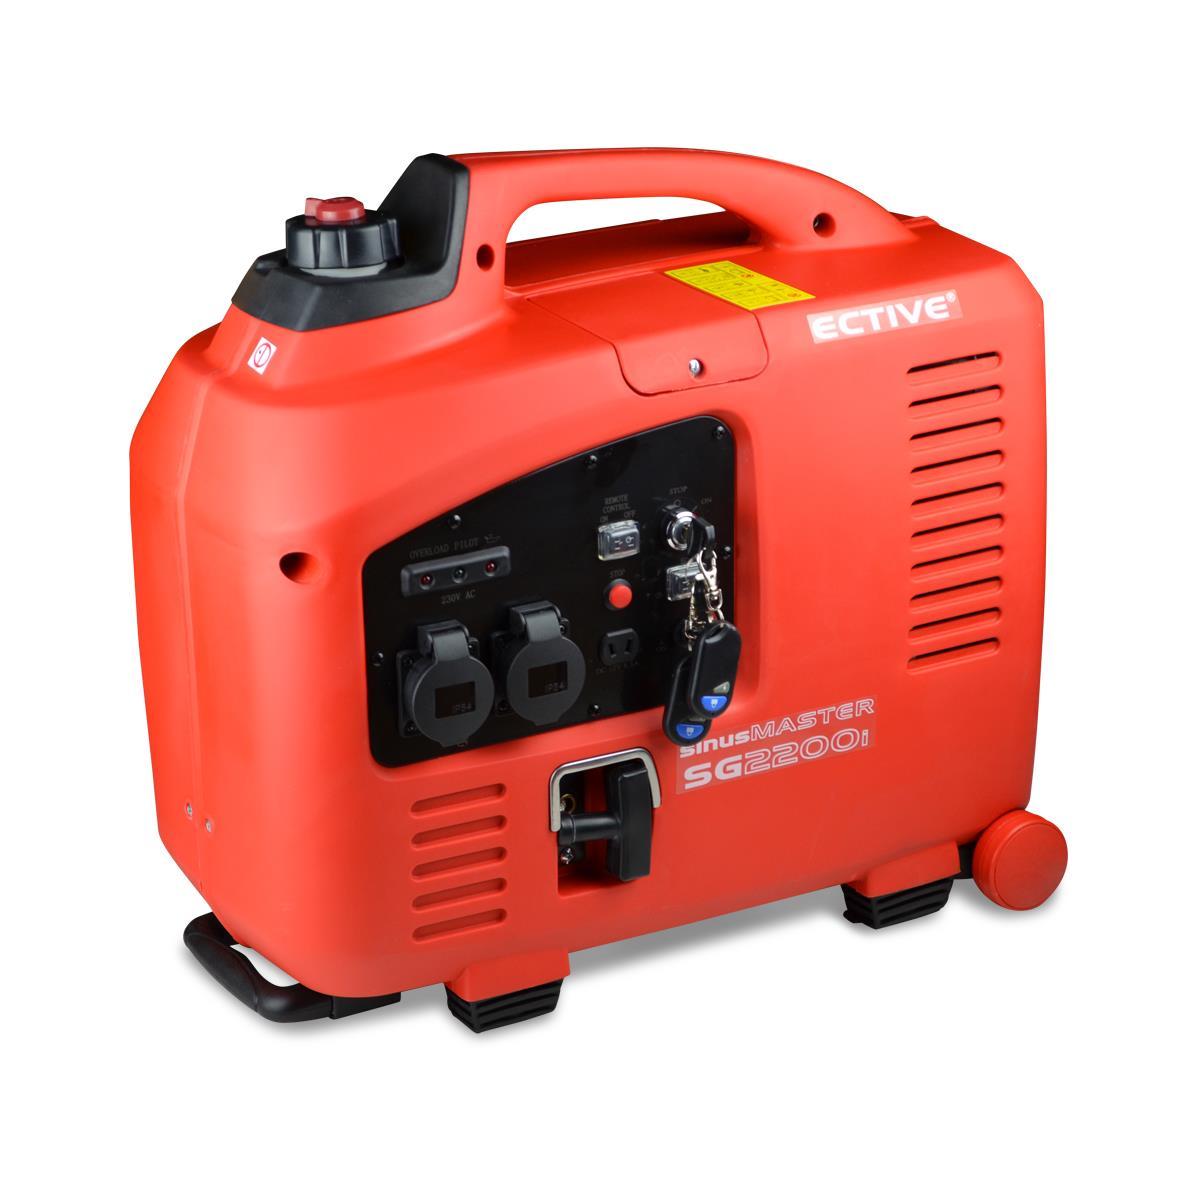 2000w 2200w Inverter Generator Digitaler Stromerzeuger